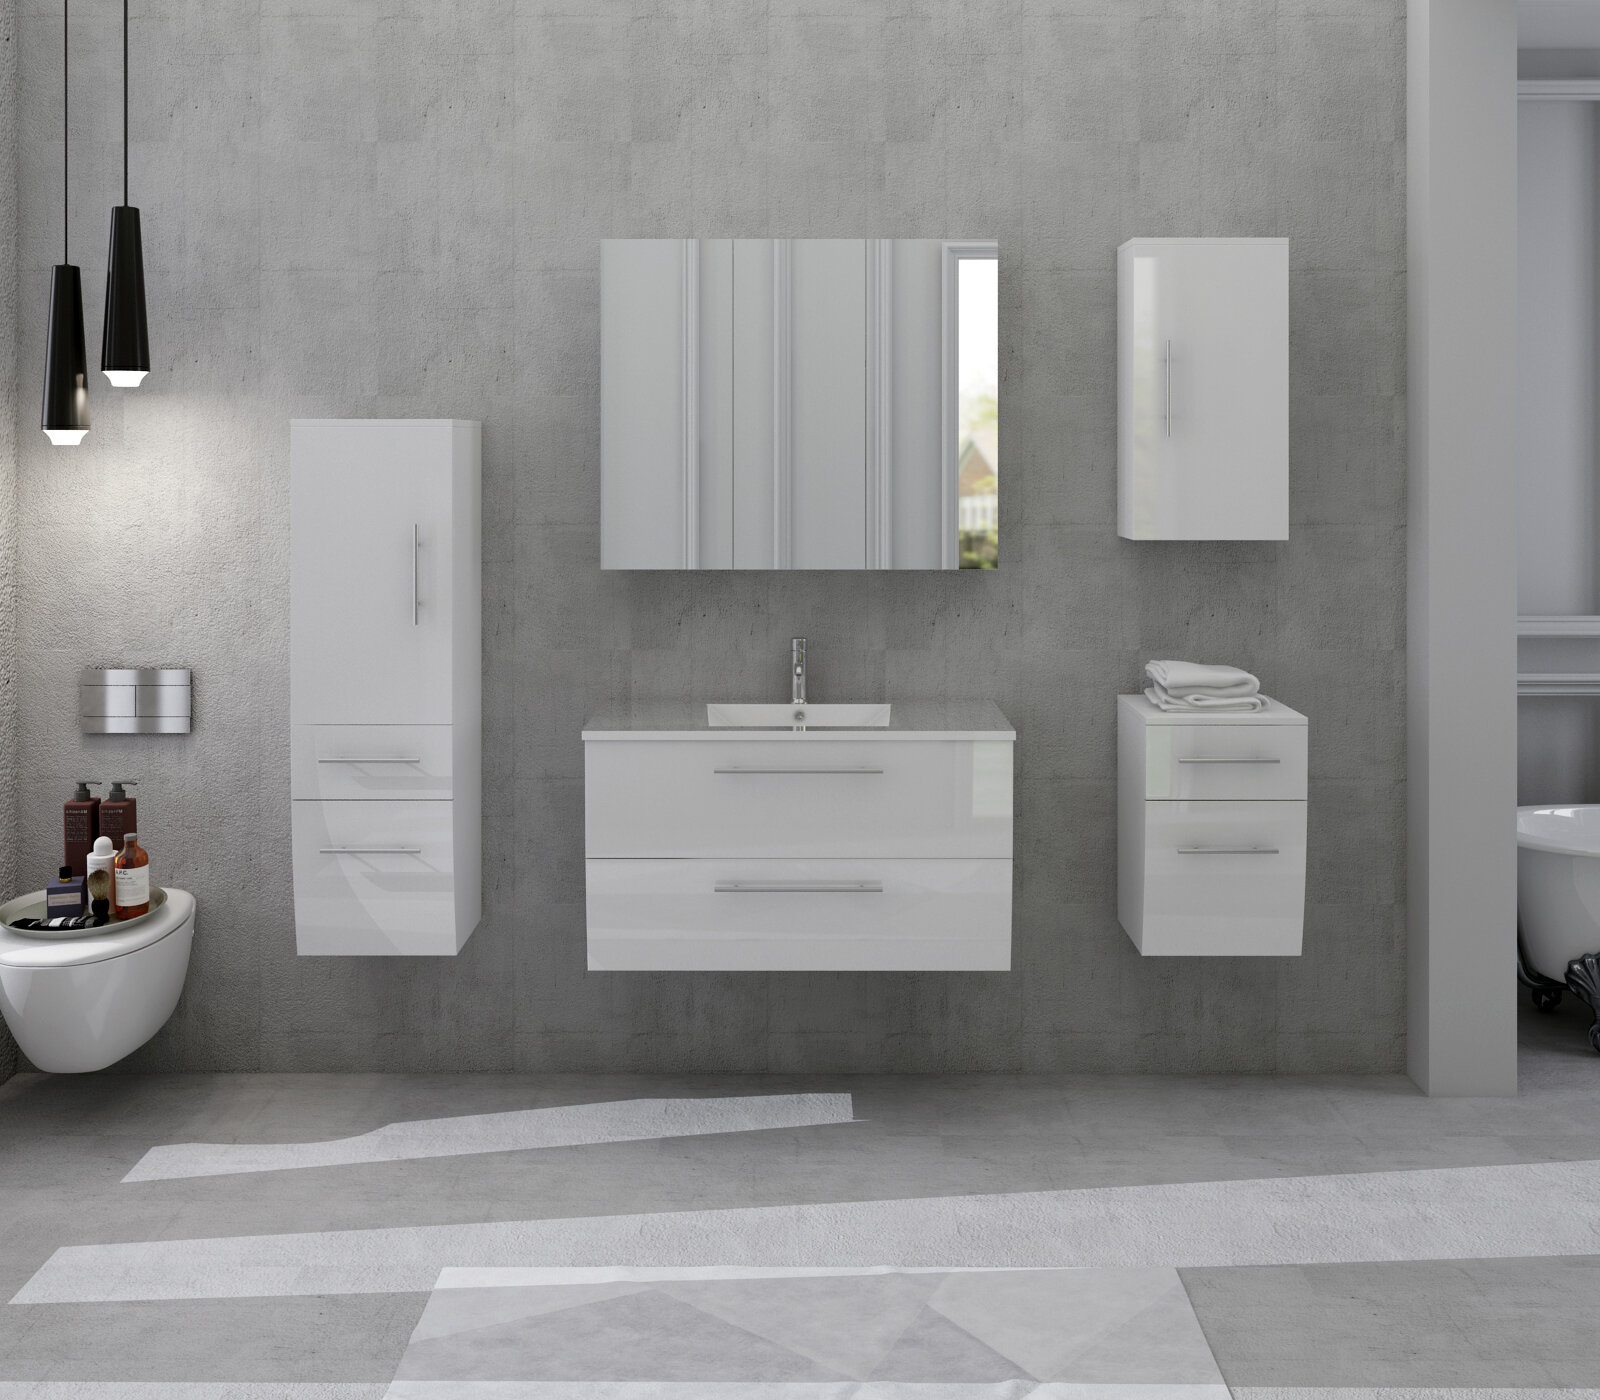 Chugg 8.8cm x 8cm Wall Mounted Bathroom Set